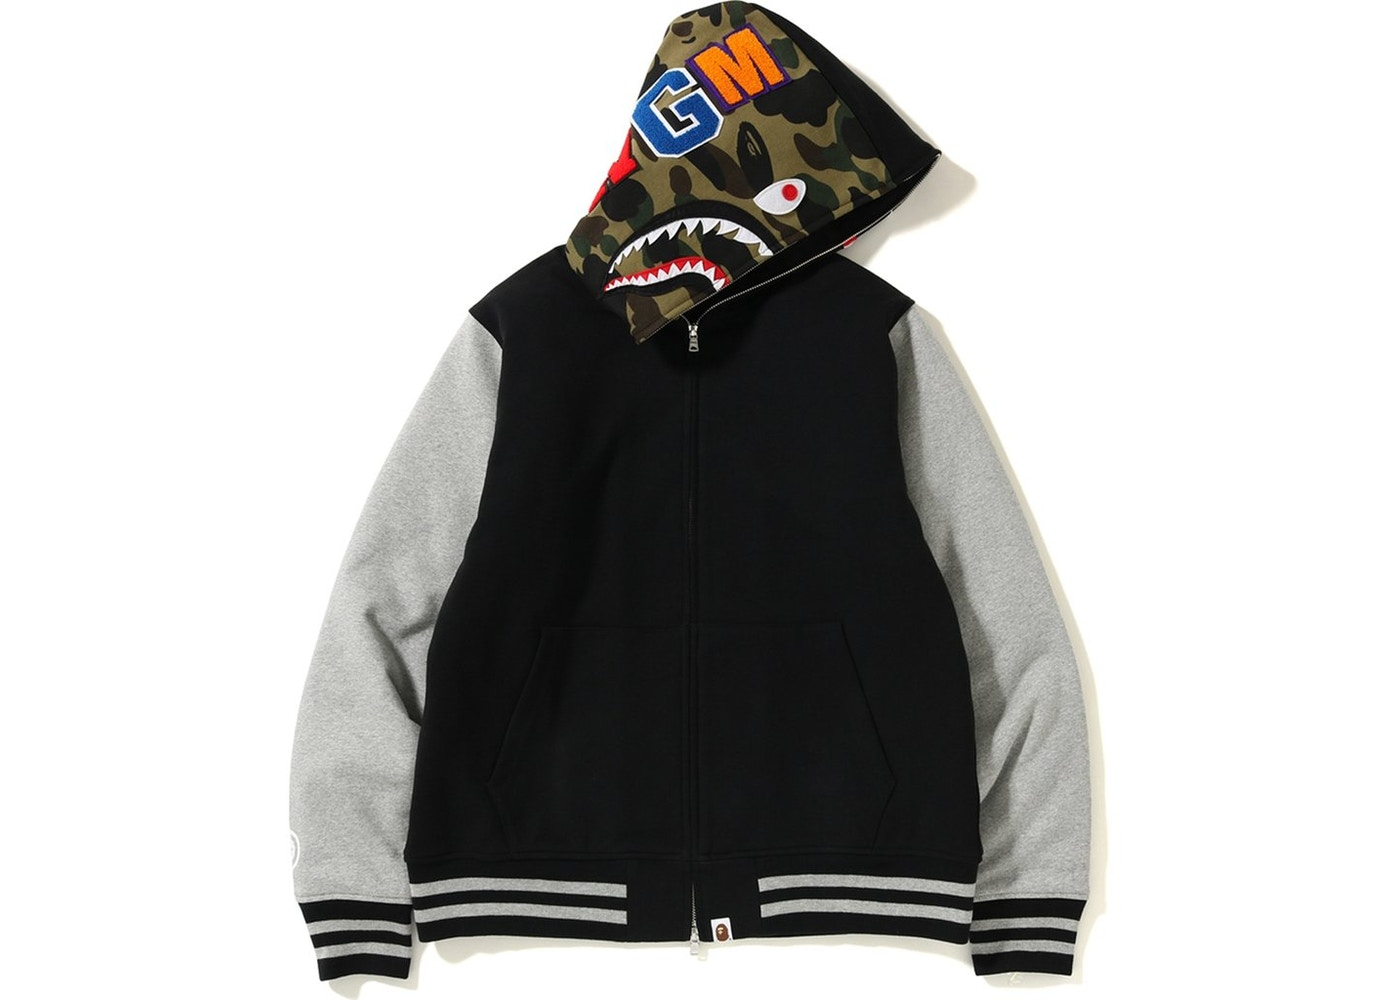 b9613679c93e Streetwear - Bape Jackets - Highest Bid